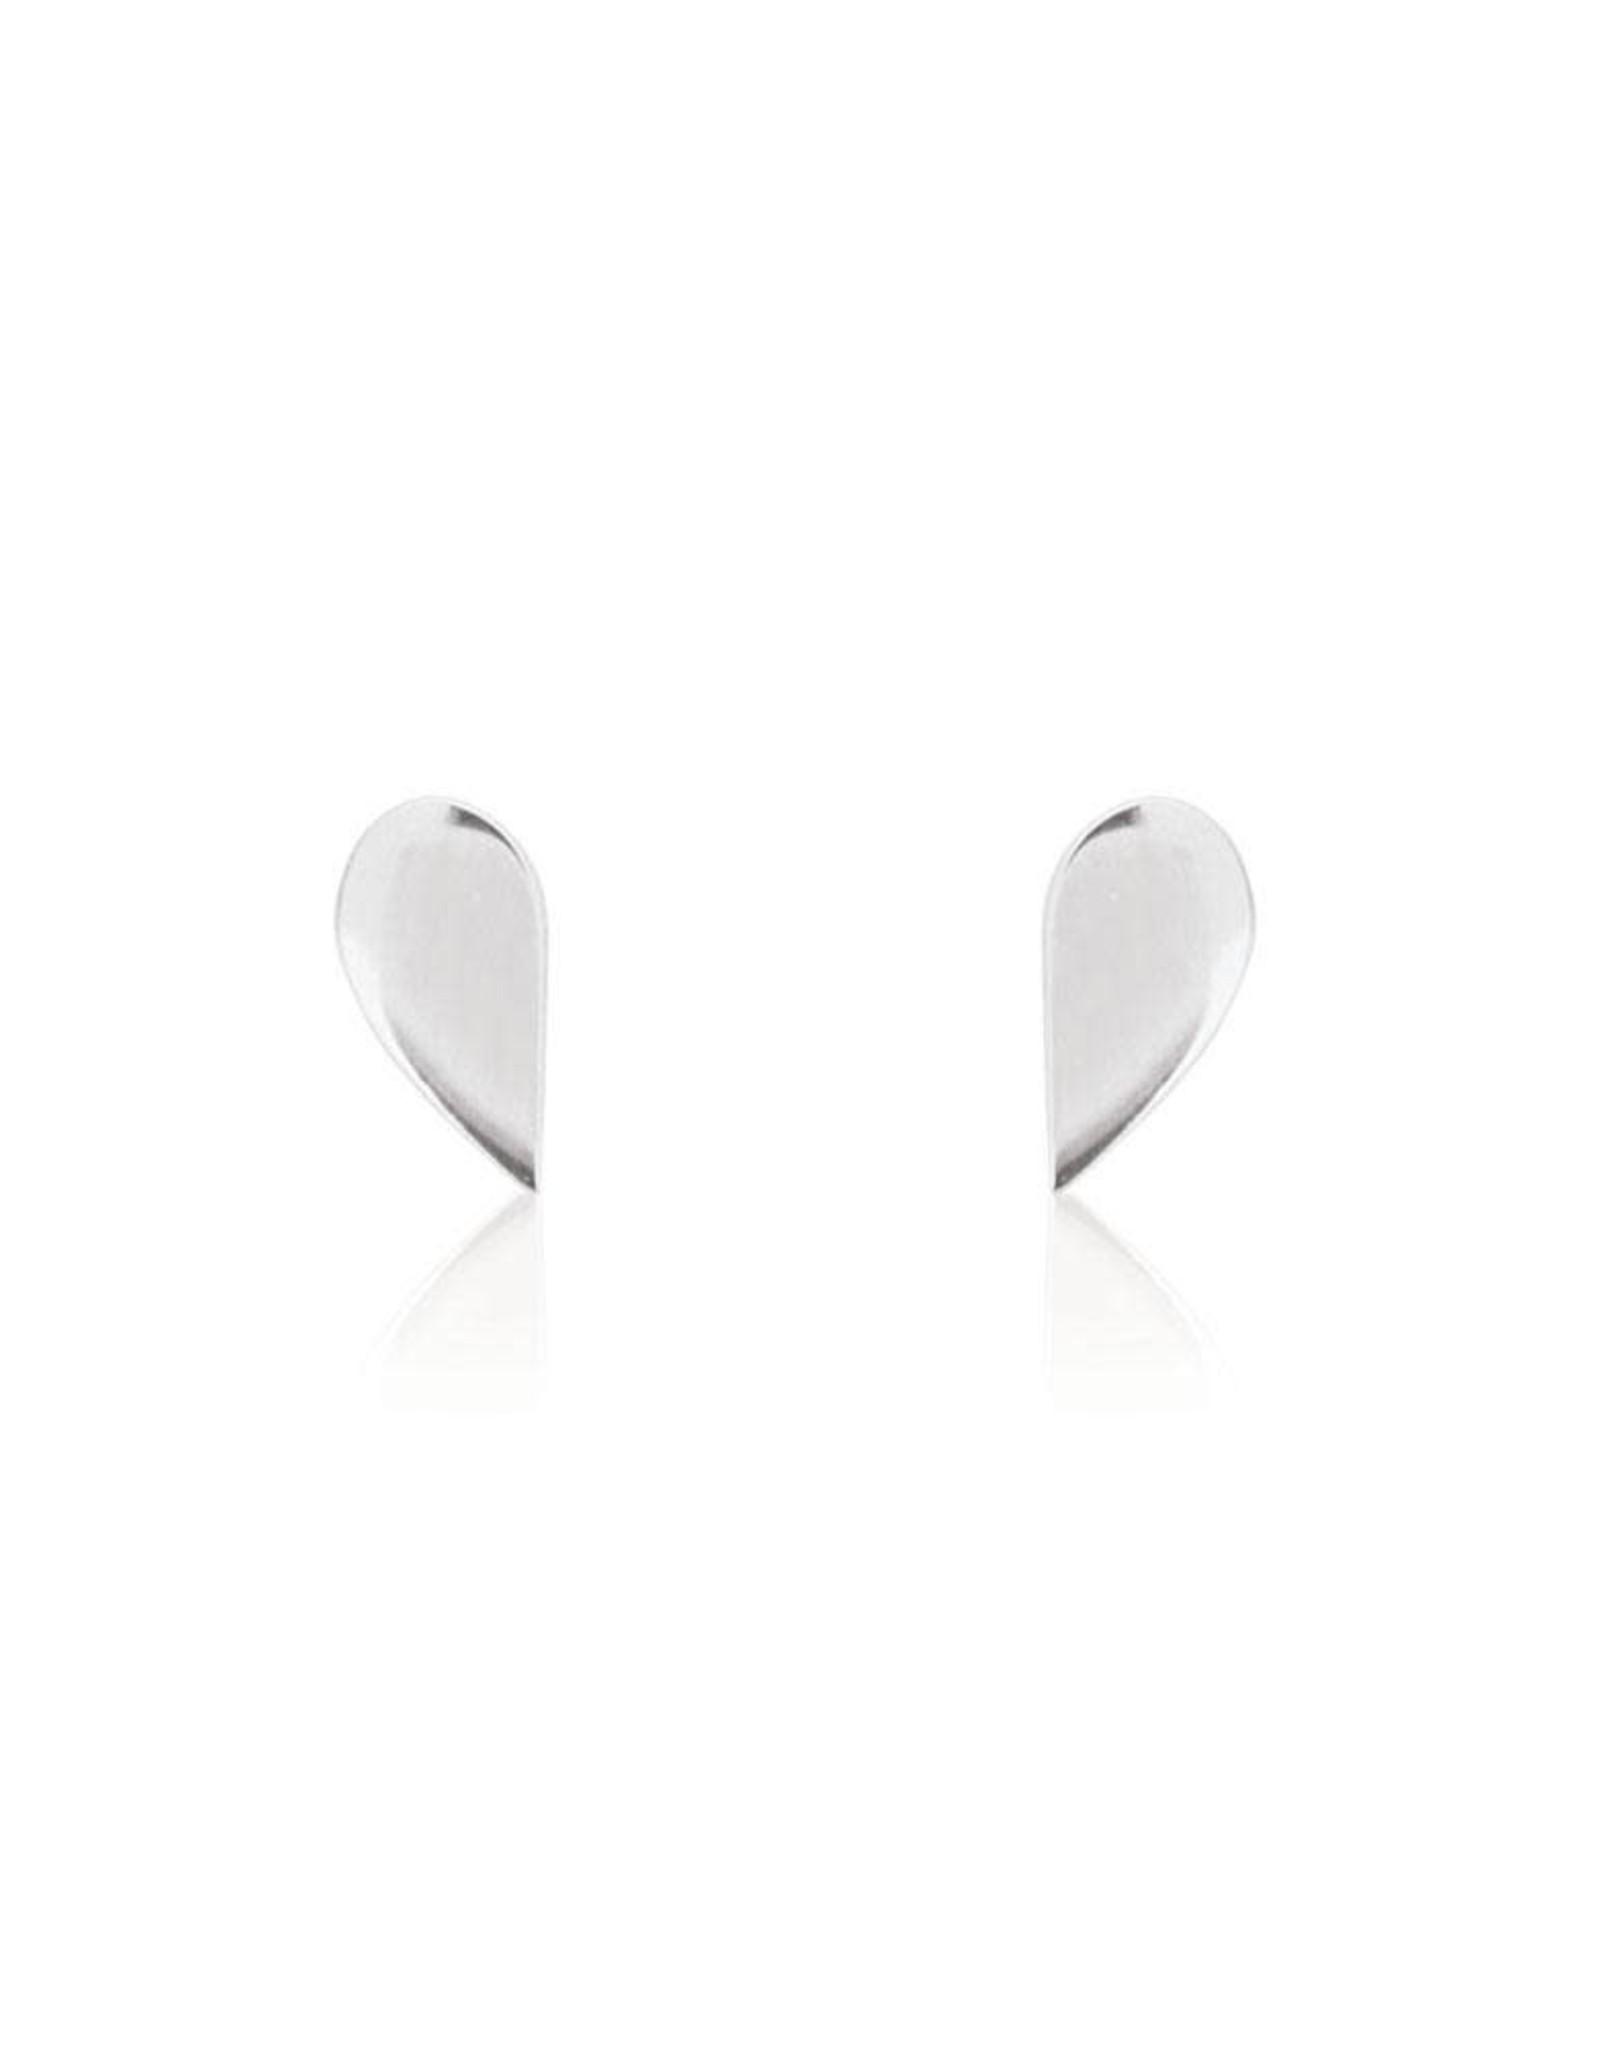 Linda Tahija Half Stud Earrings, Silver